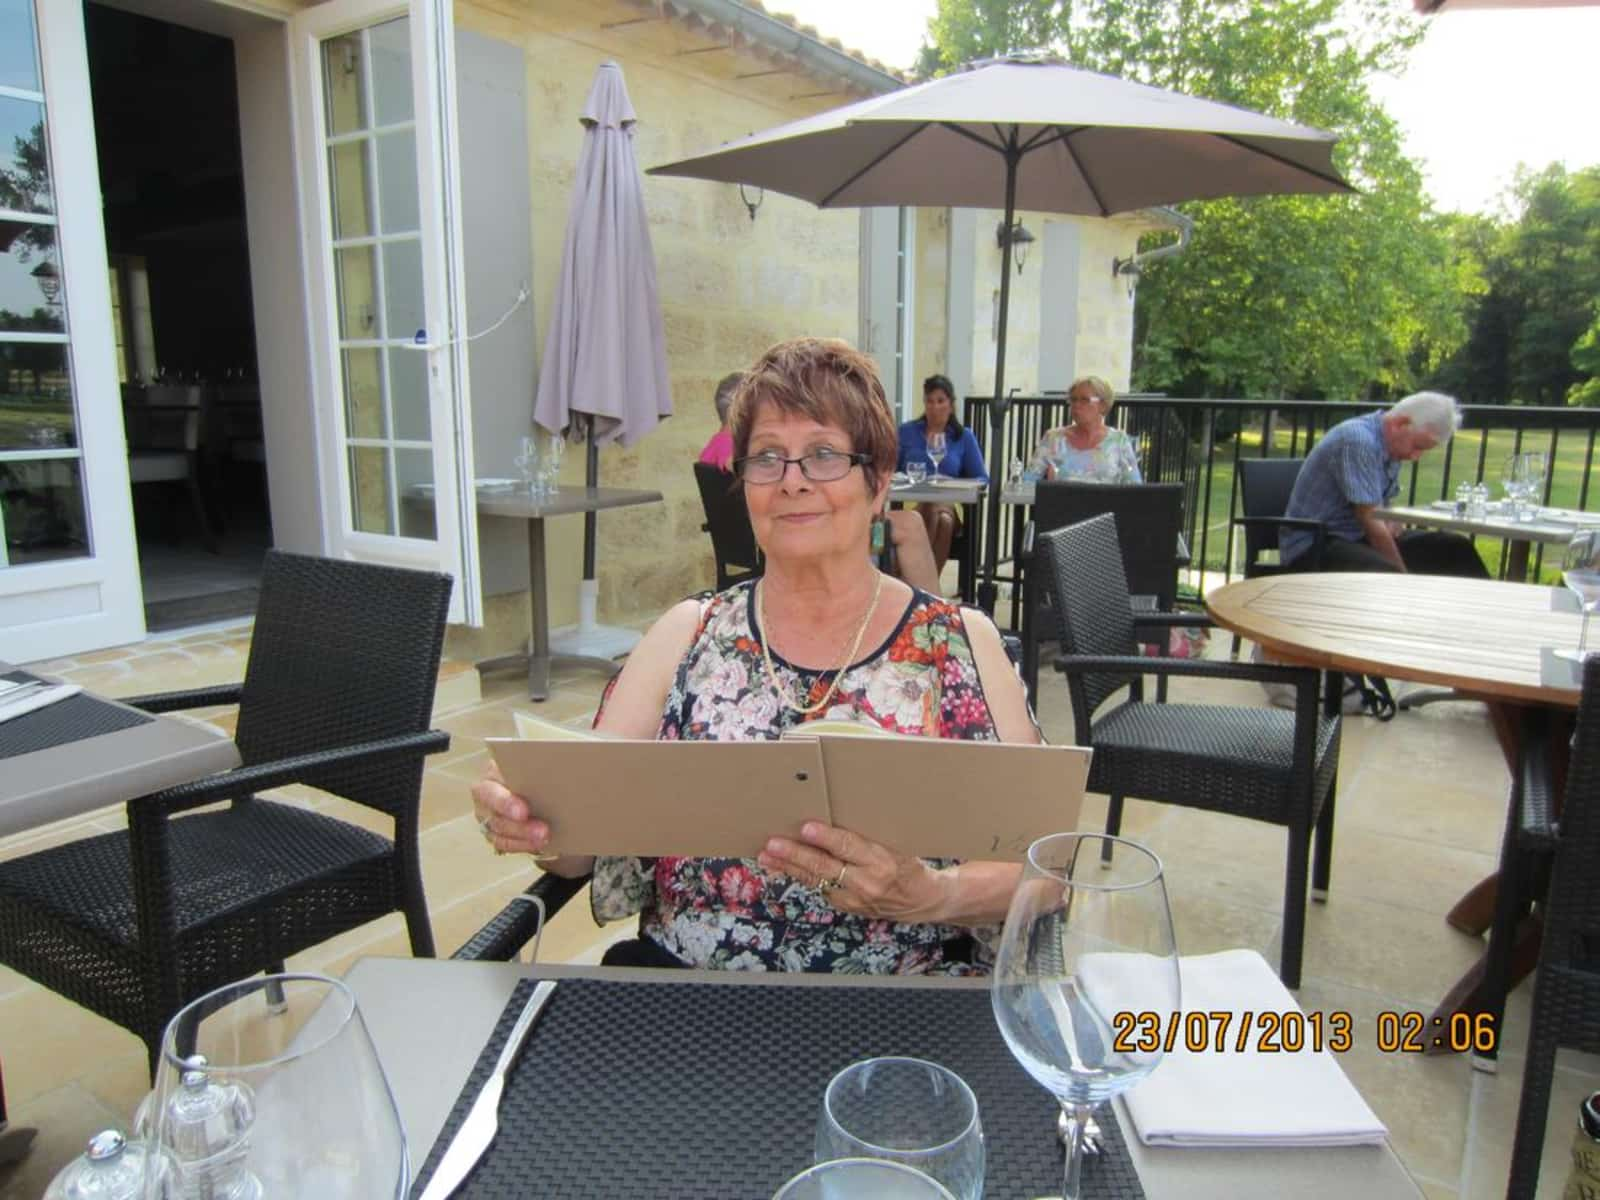 Jeannie & Hywel from Meadow Springs, Western Australia, Australia